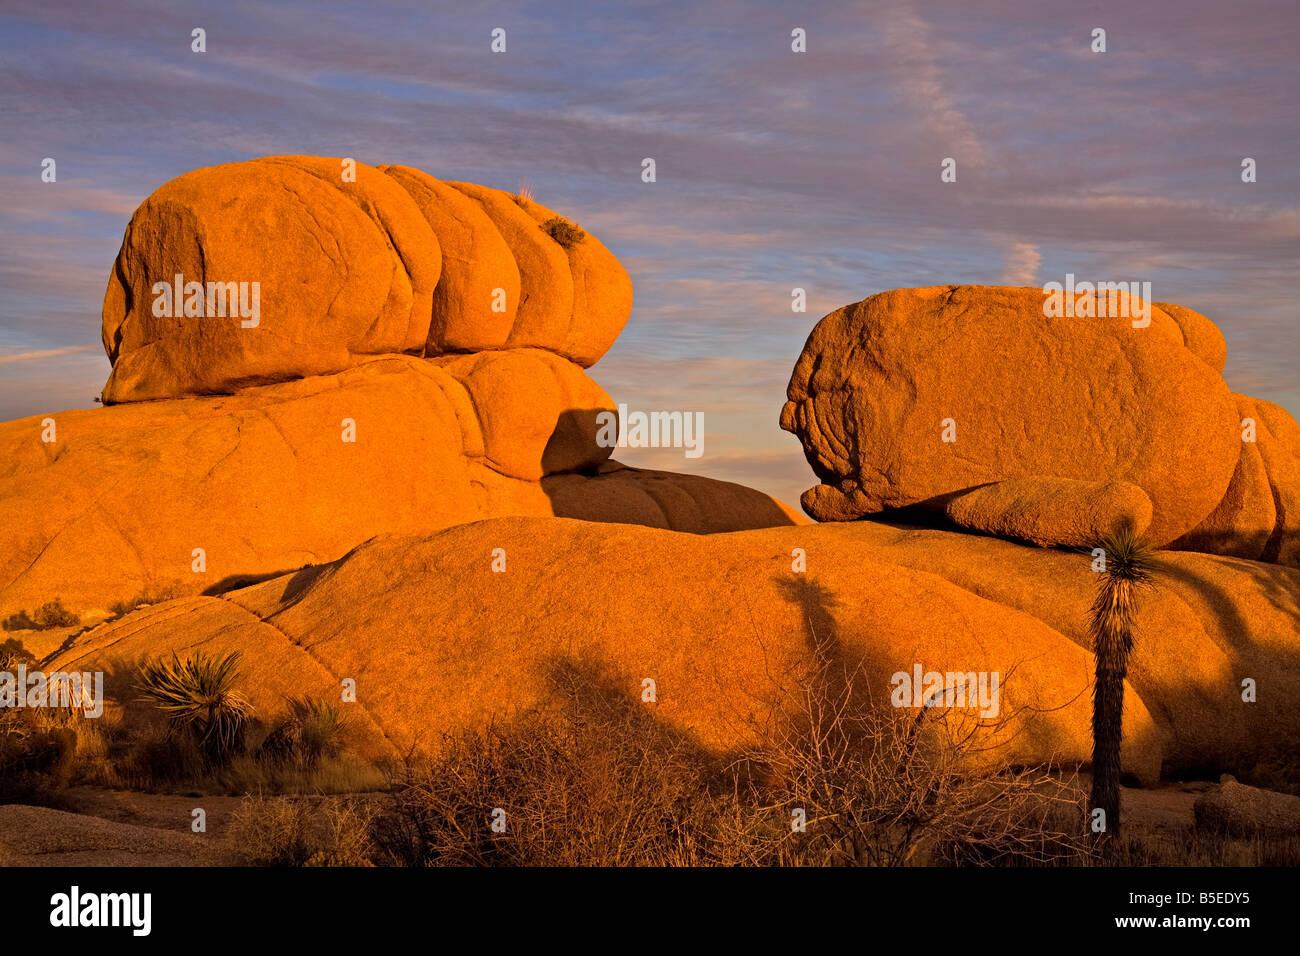 Jumbo Rocks area, Joshua Tree National Park, California, USA, North America - Stock Image